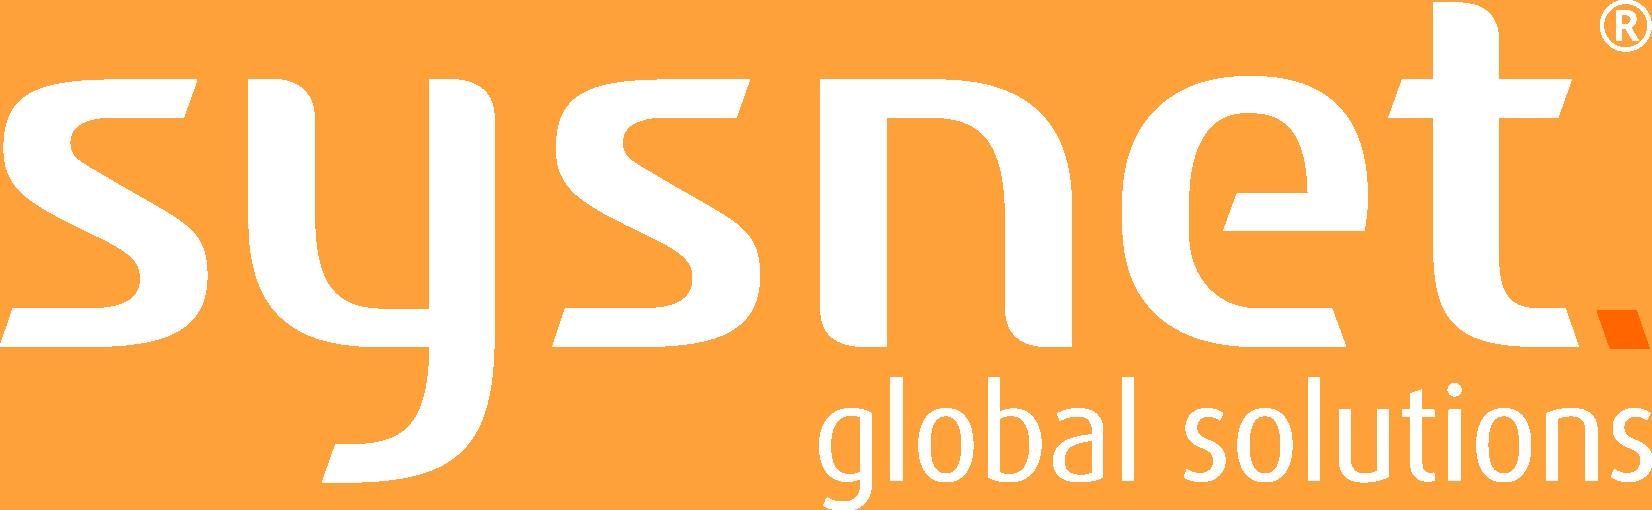 Sysnet GS